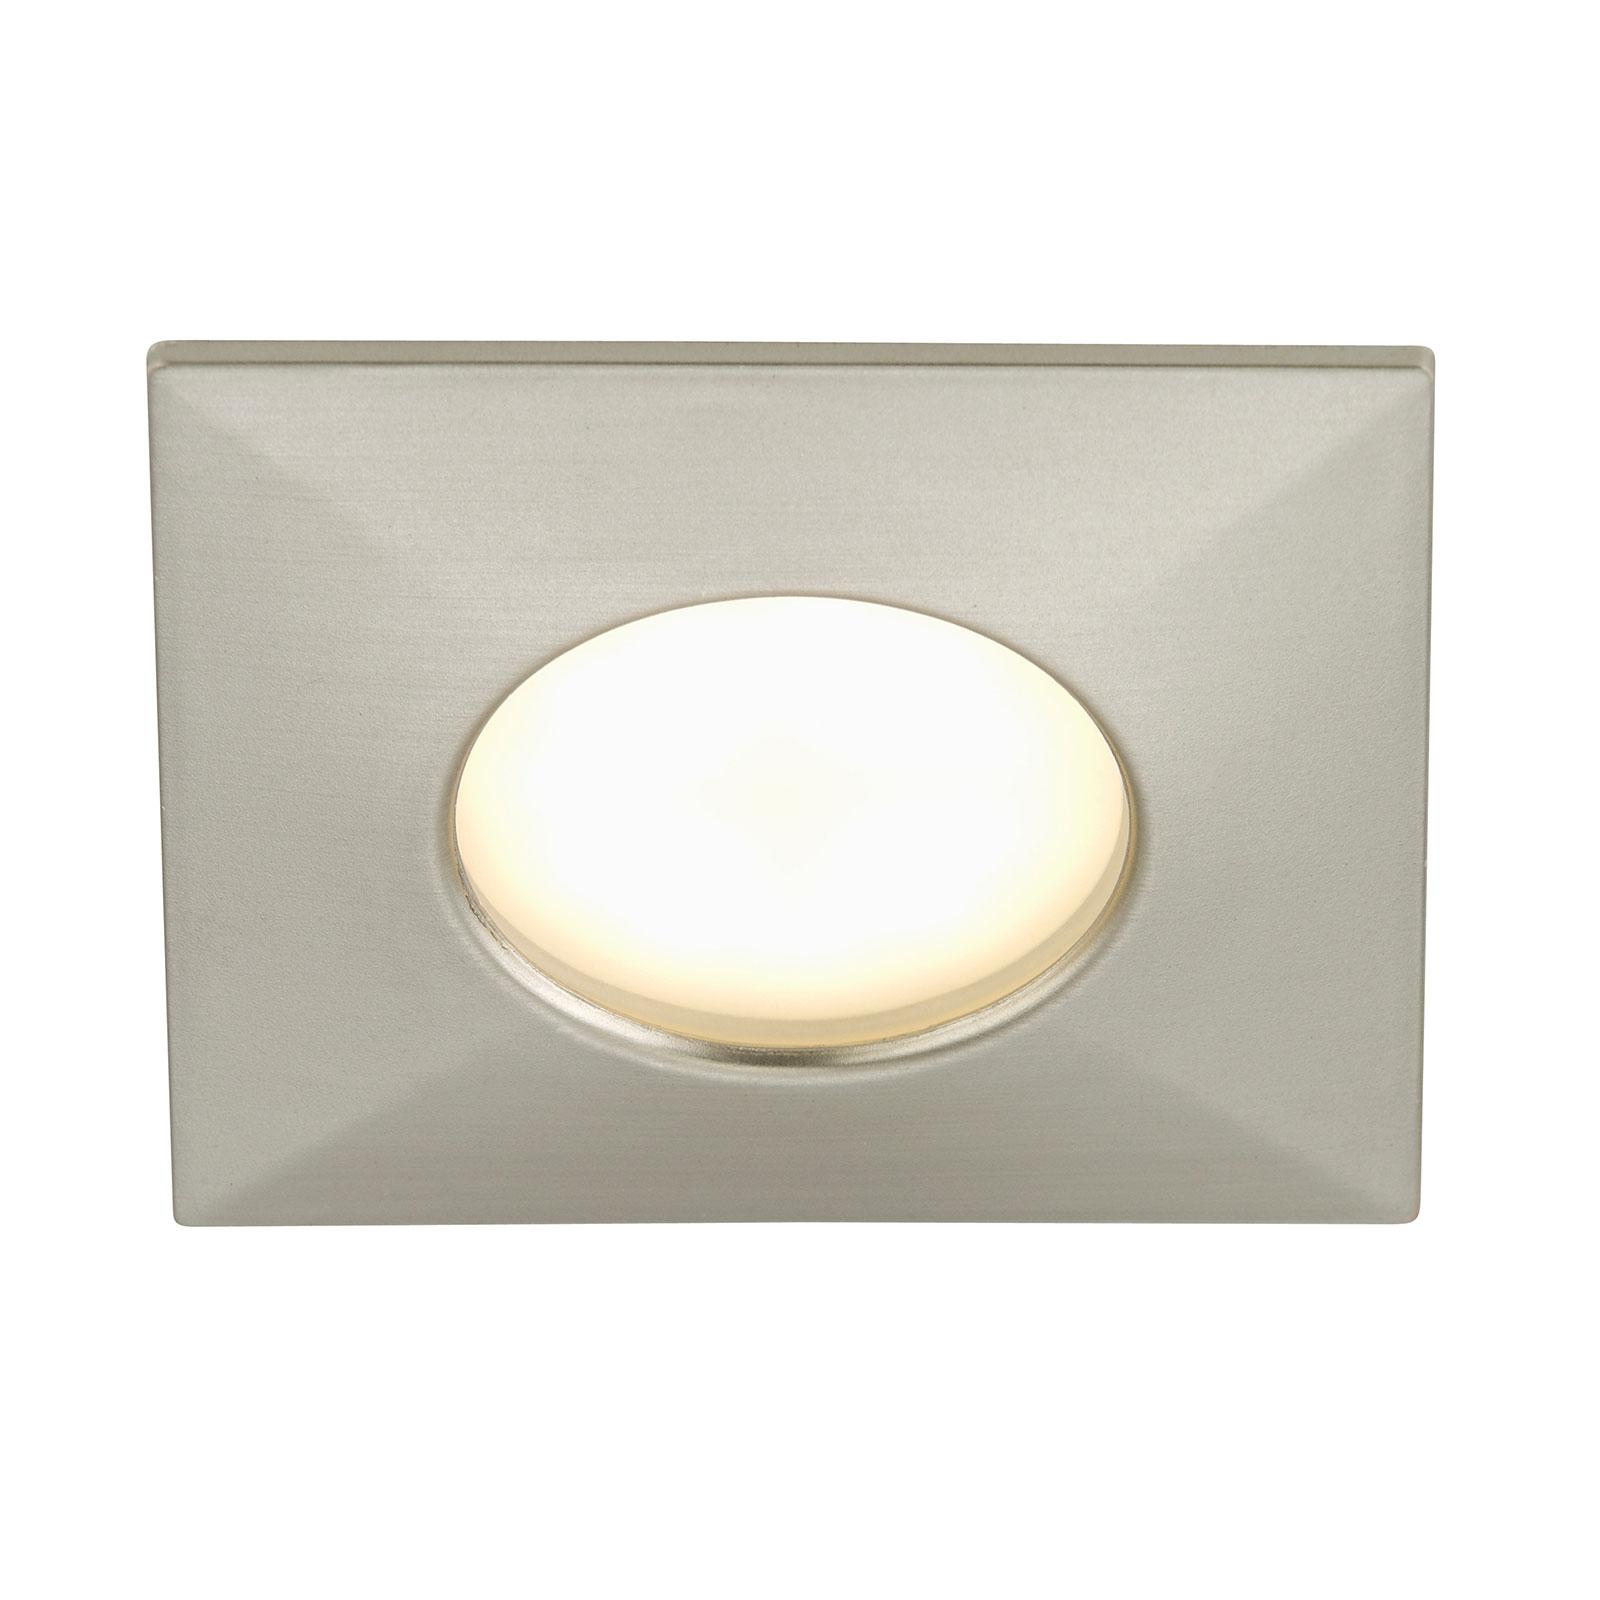 Rect. LED recessed light Ben, outdoor, matt nickel_1510335_1